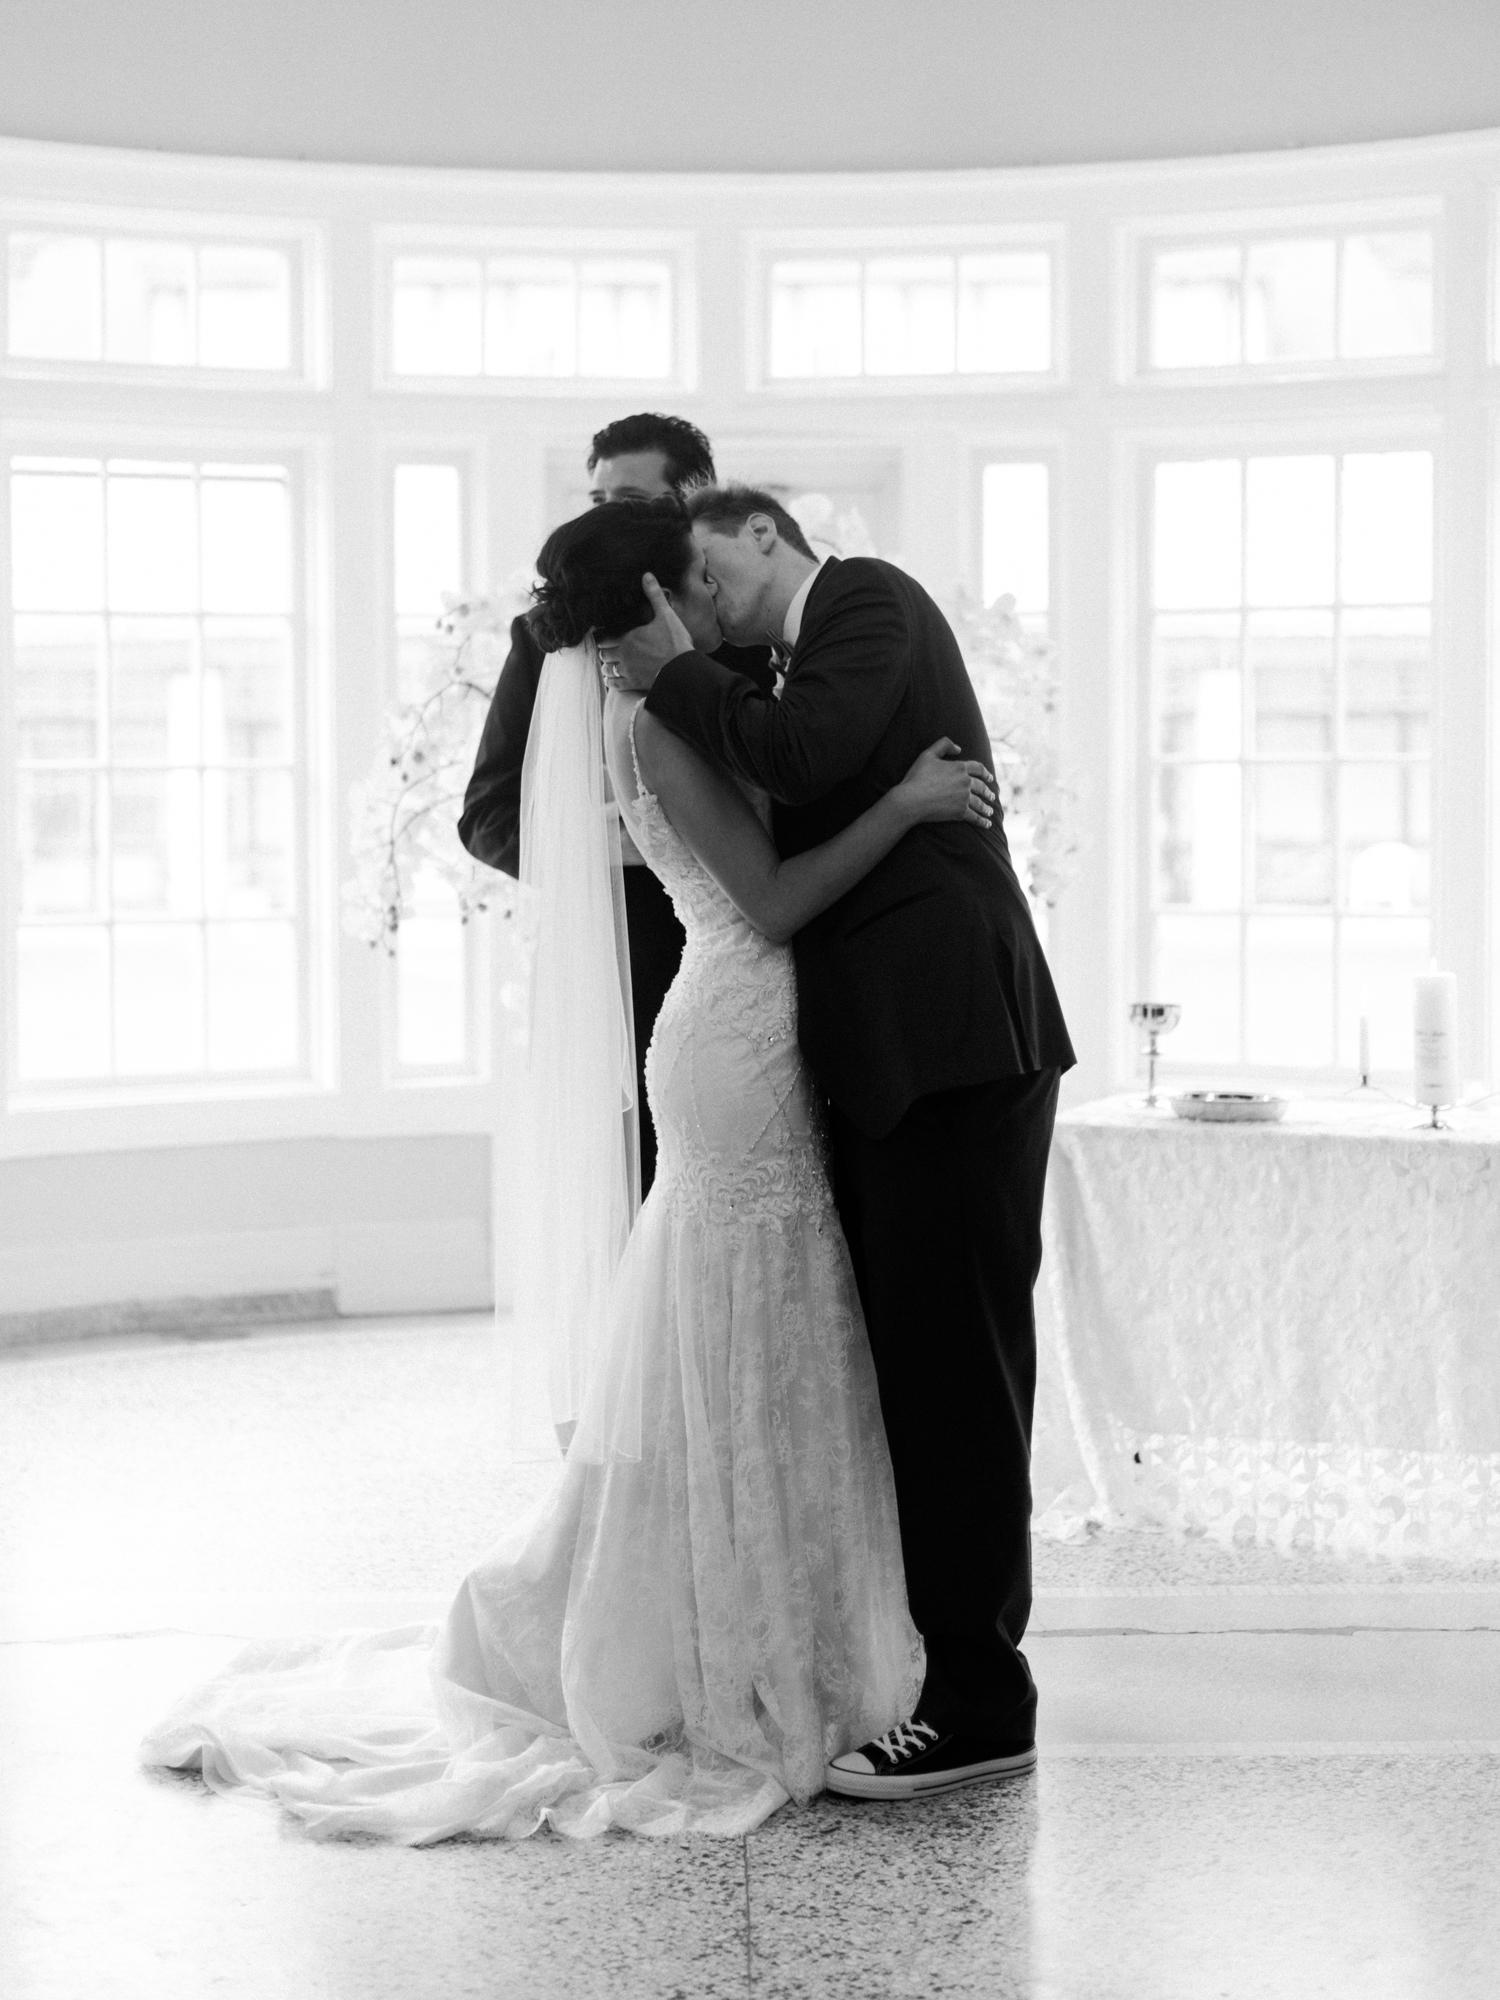 saratoga-springs-new-york-national-museum-of-dance-film-wedding-photographer-44.jpg